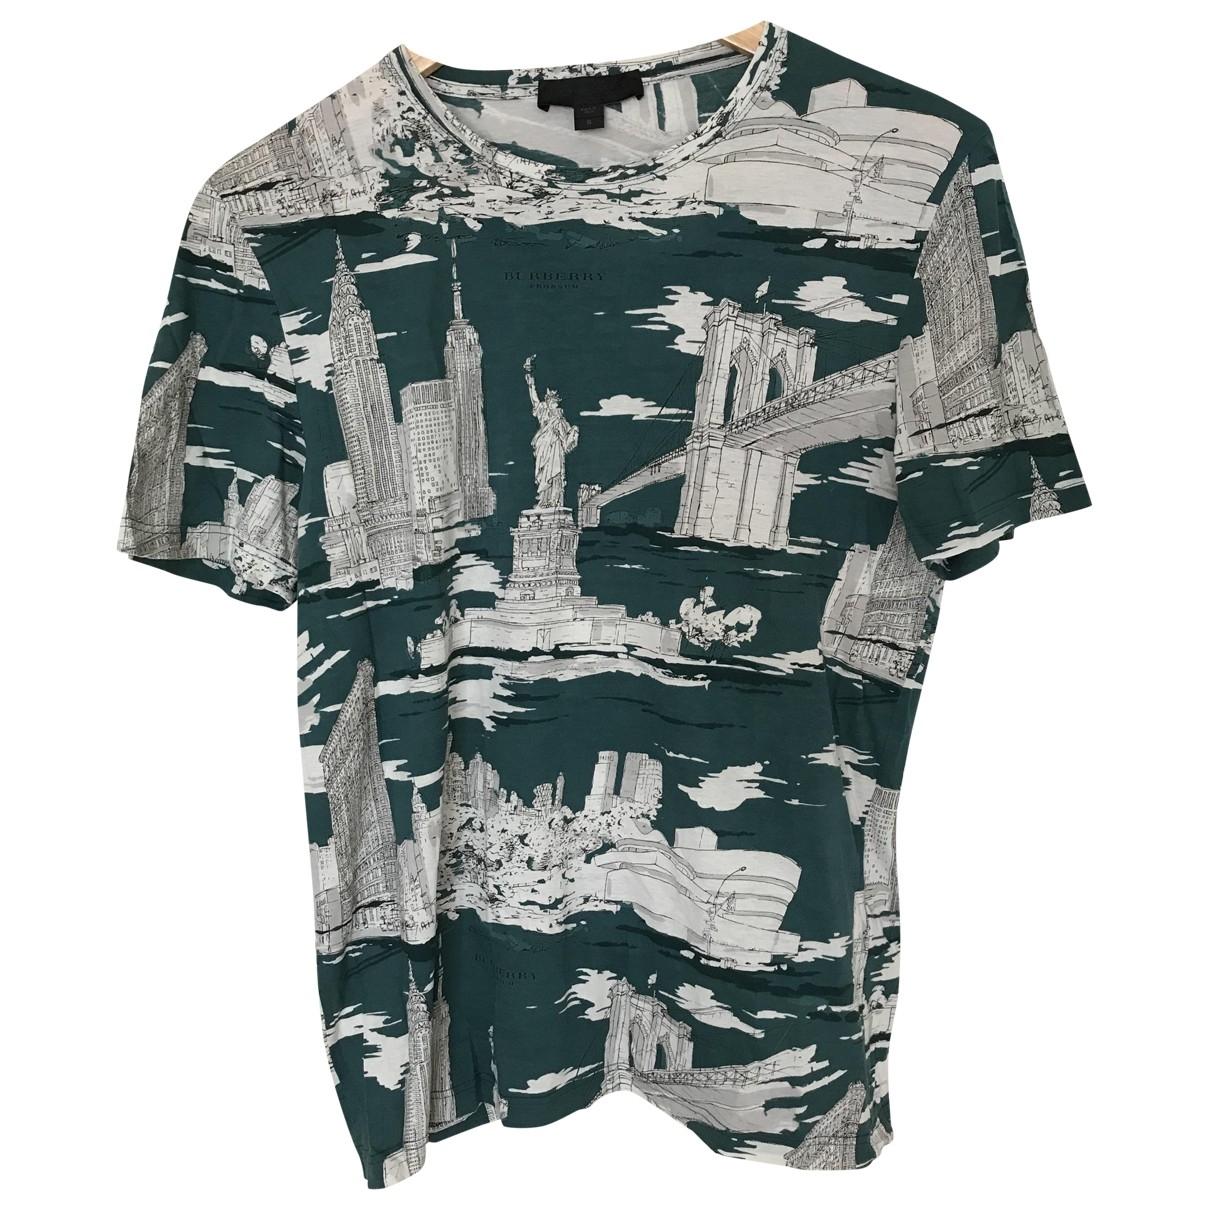 Burberry - Tee shirts   pour homme en coton - turquoise